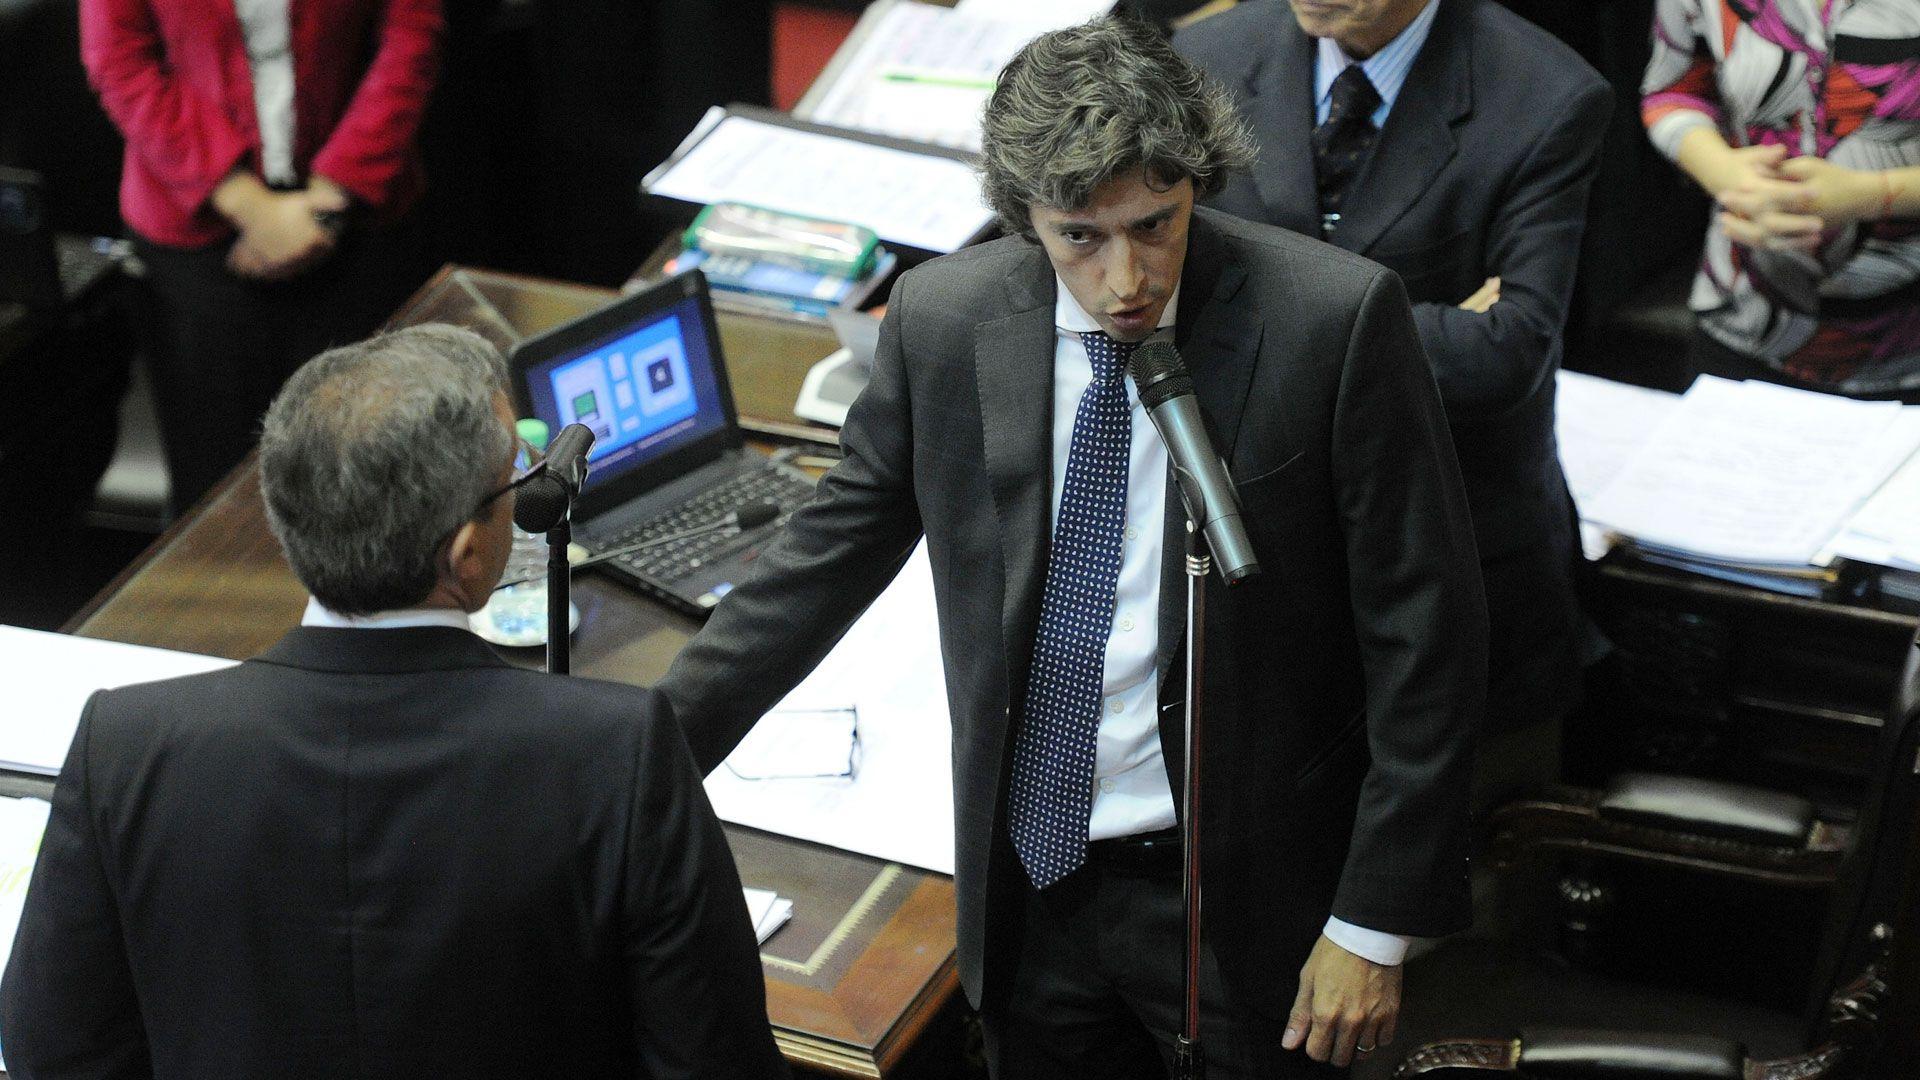 Juan Forlón